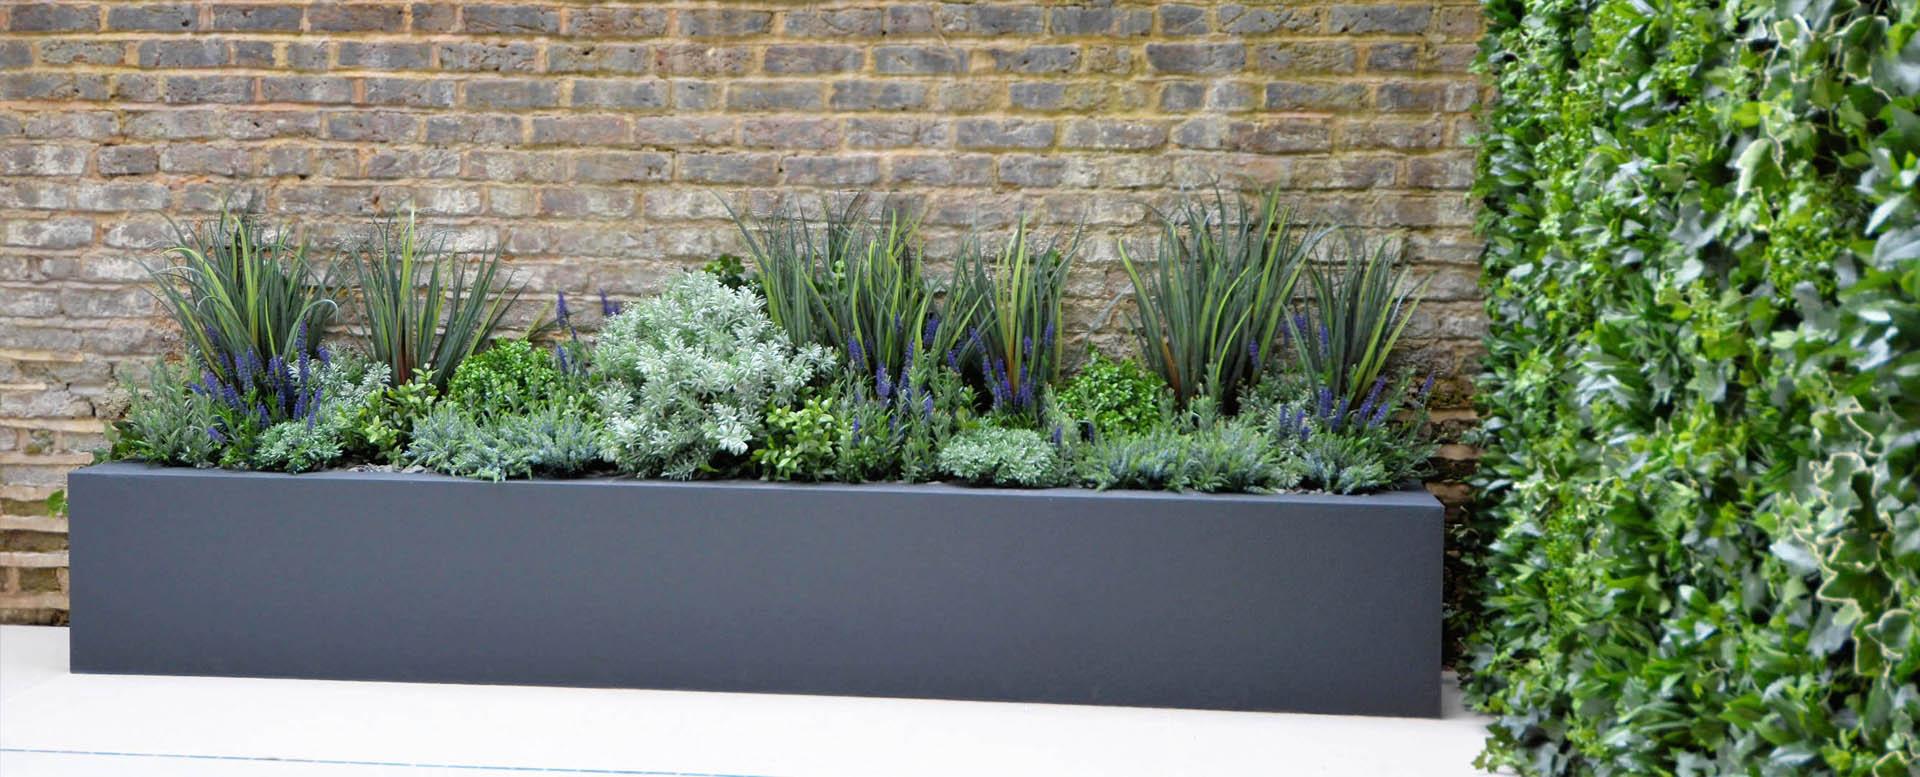 720 Fake Landscapes mixed modern planter